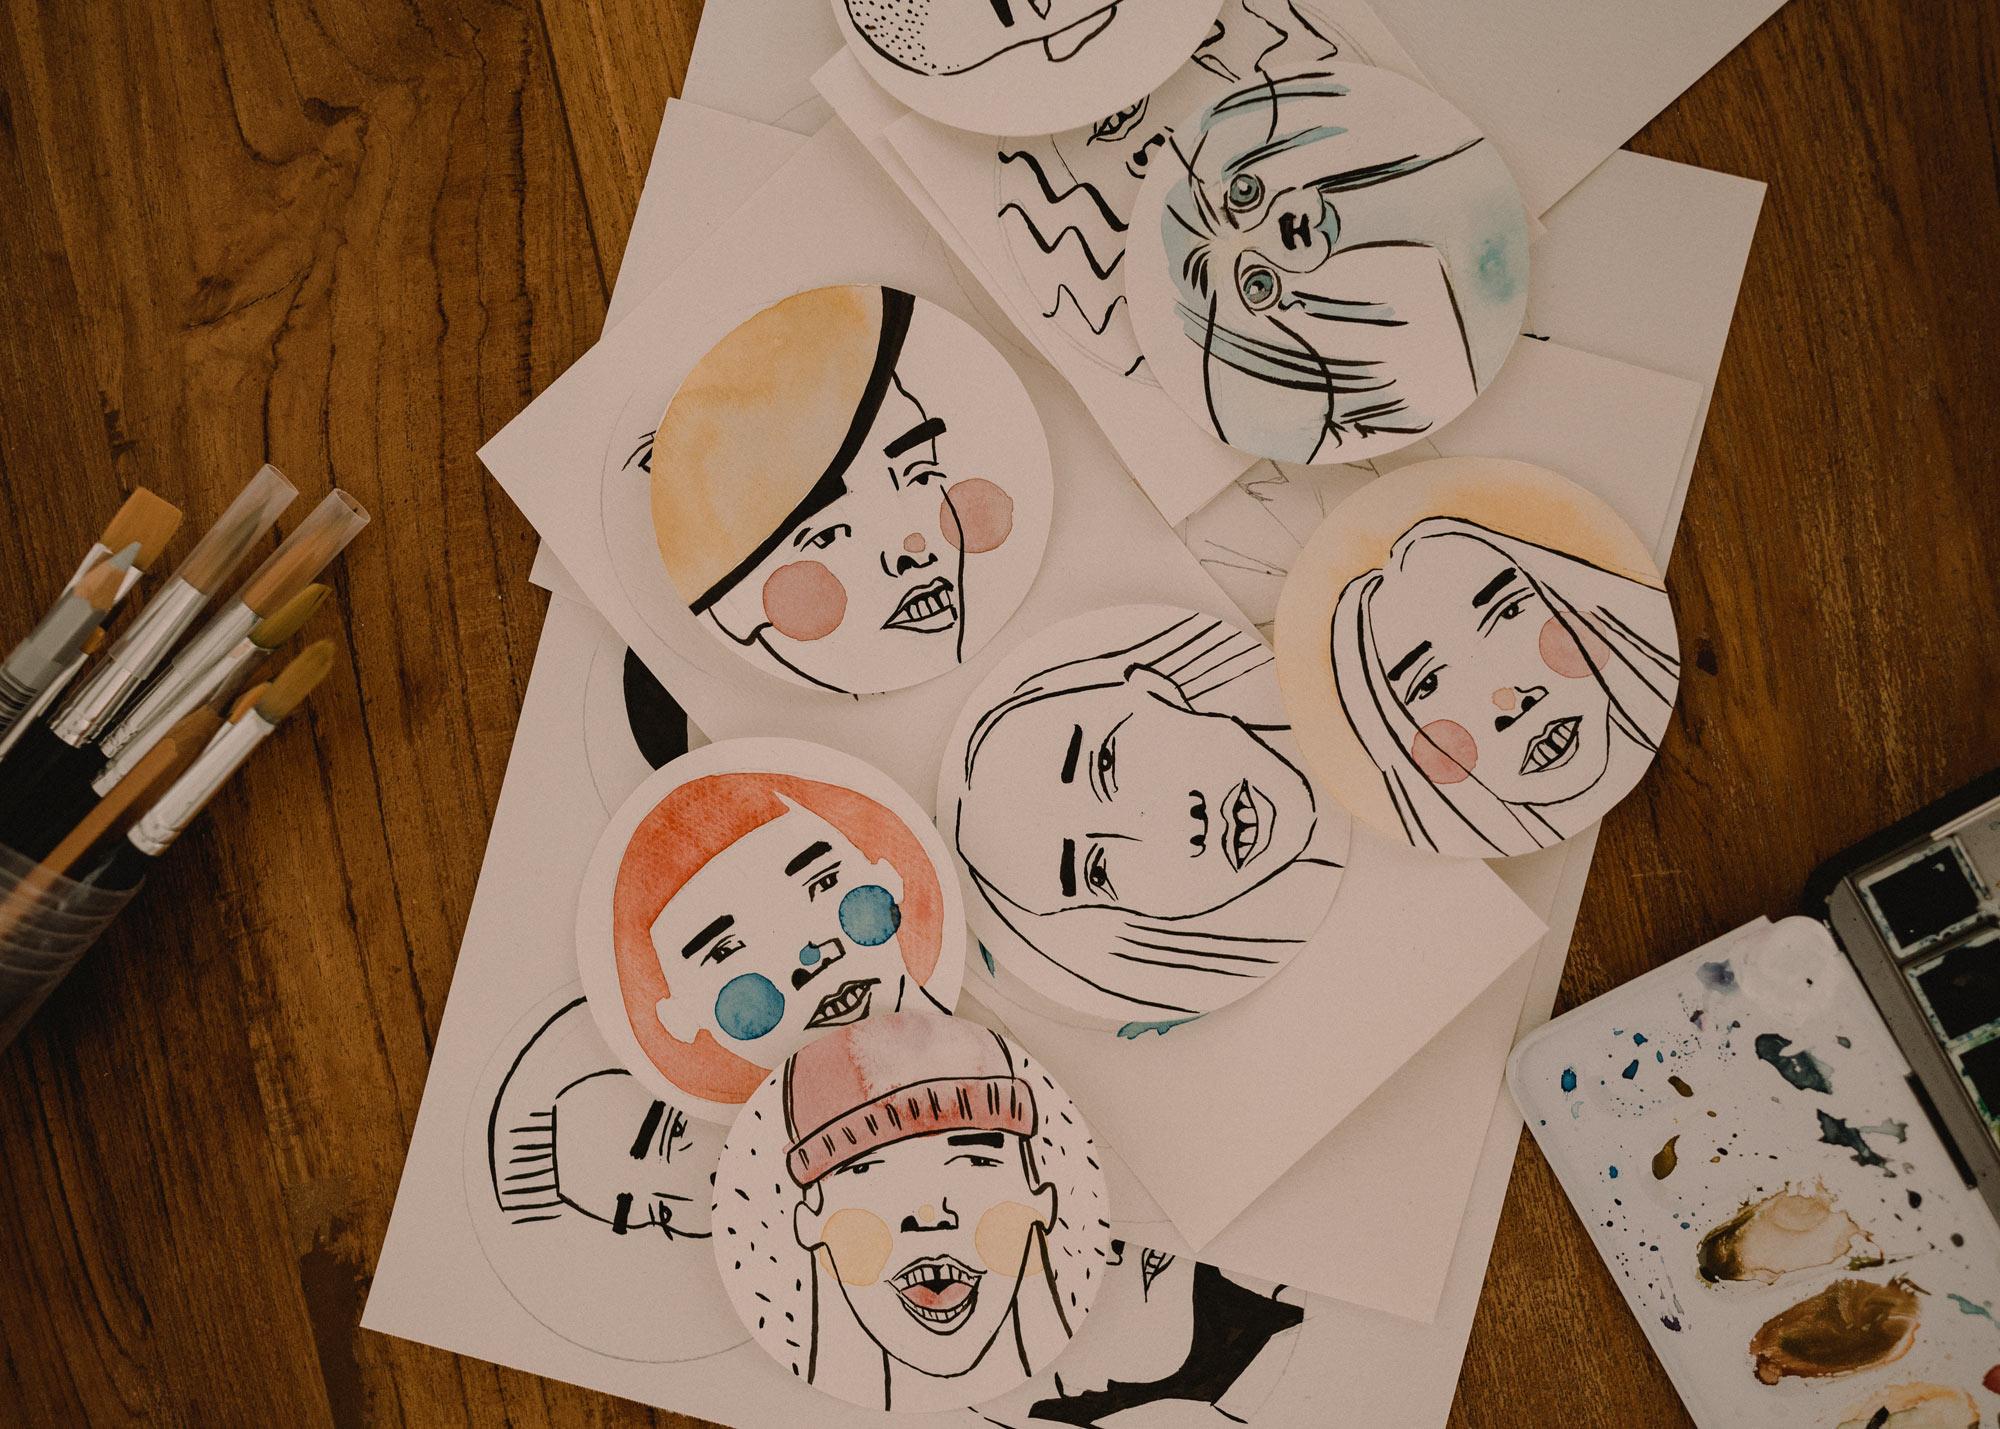 Viele Entwürfe auf Papier